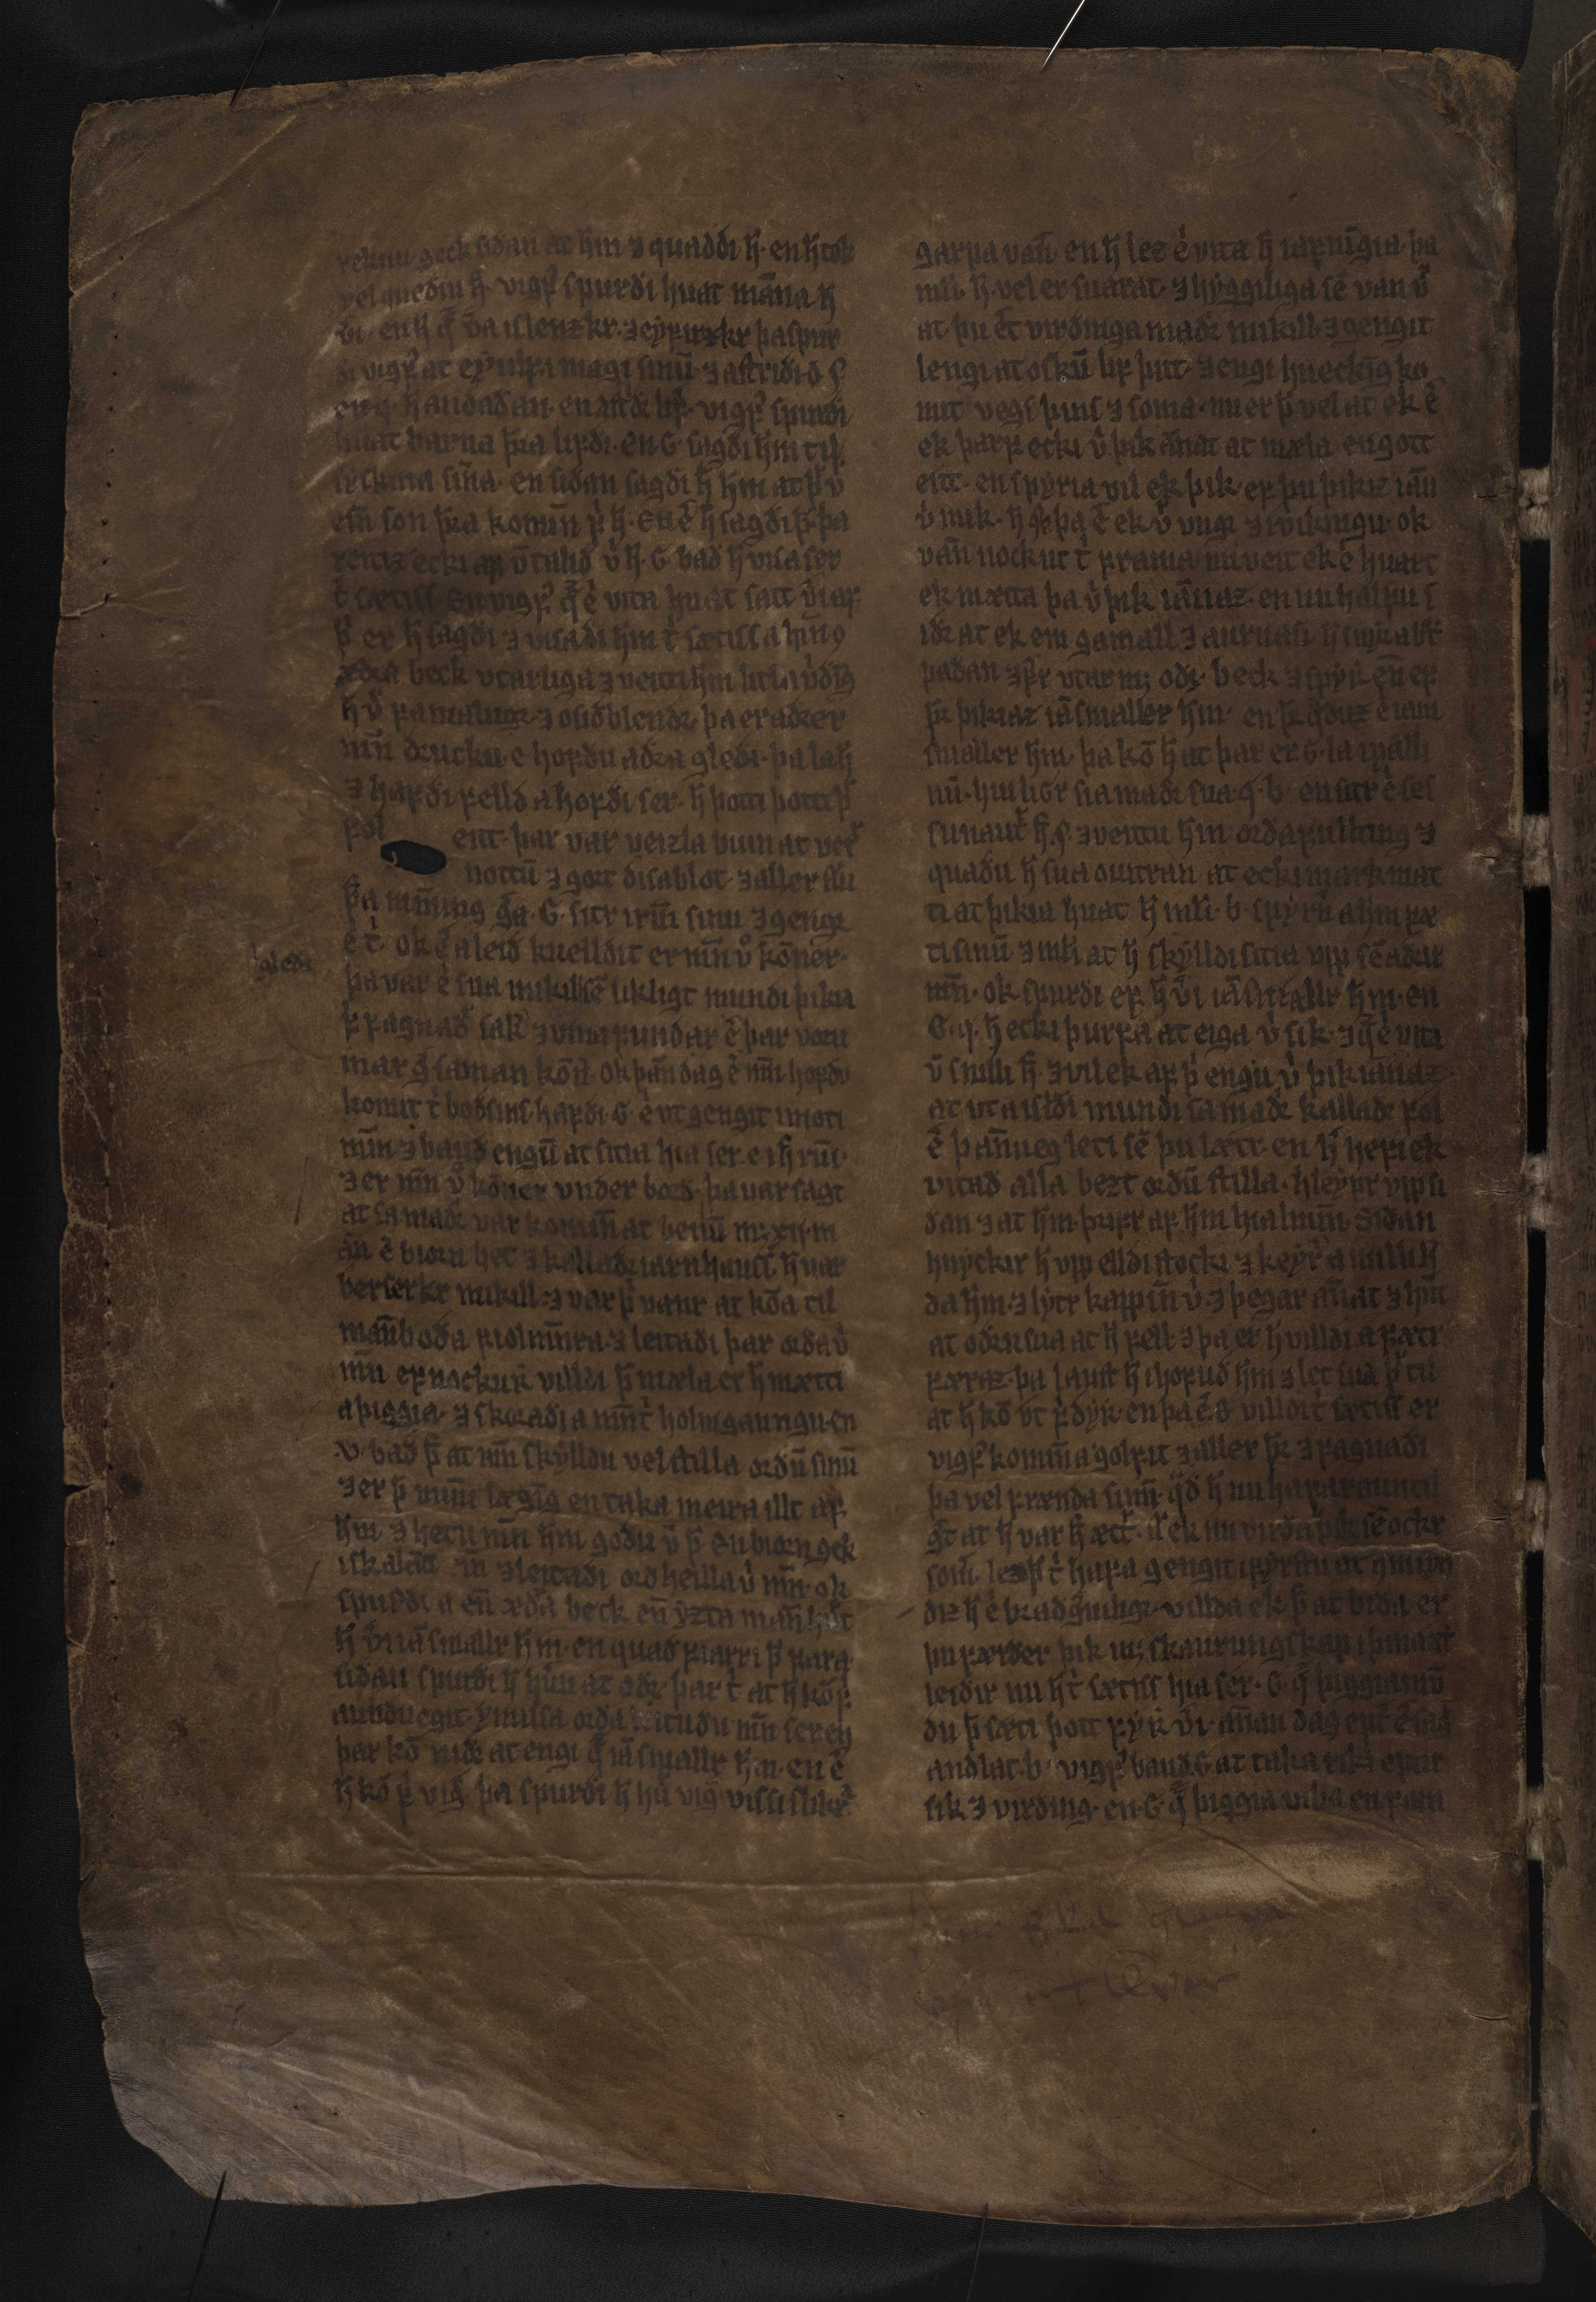 AM 132 fol - 131v